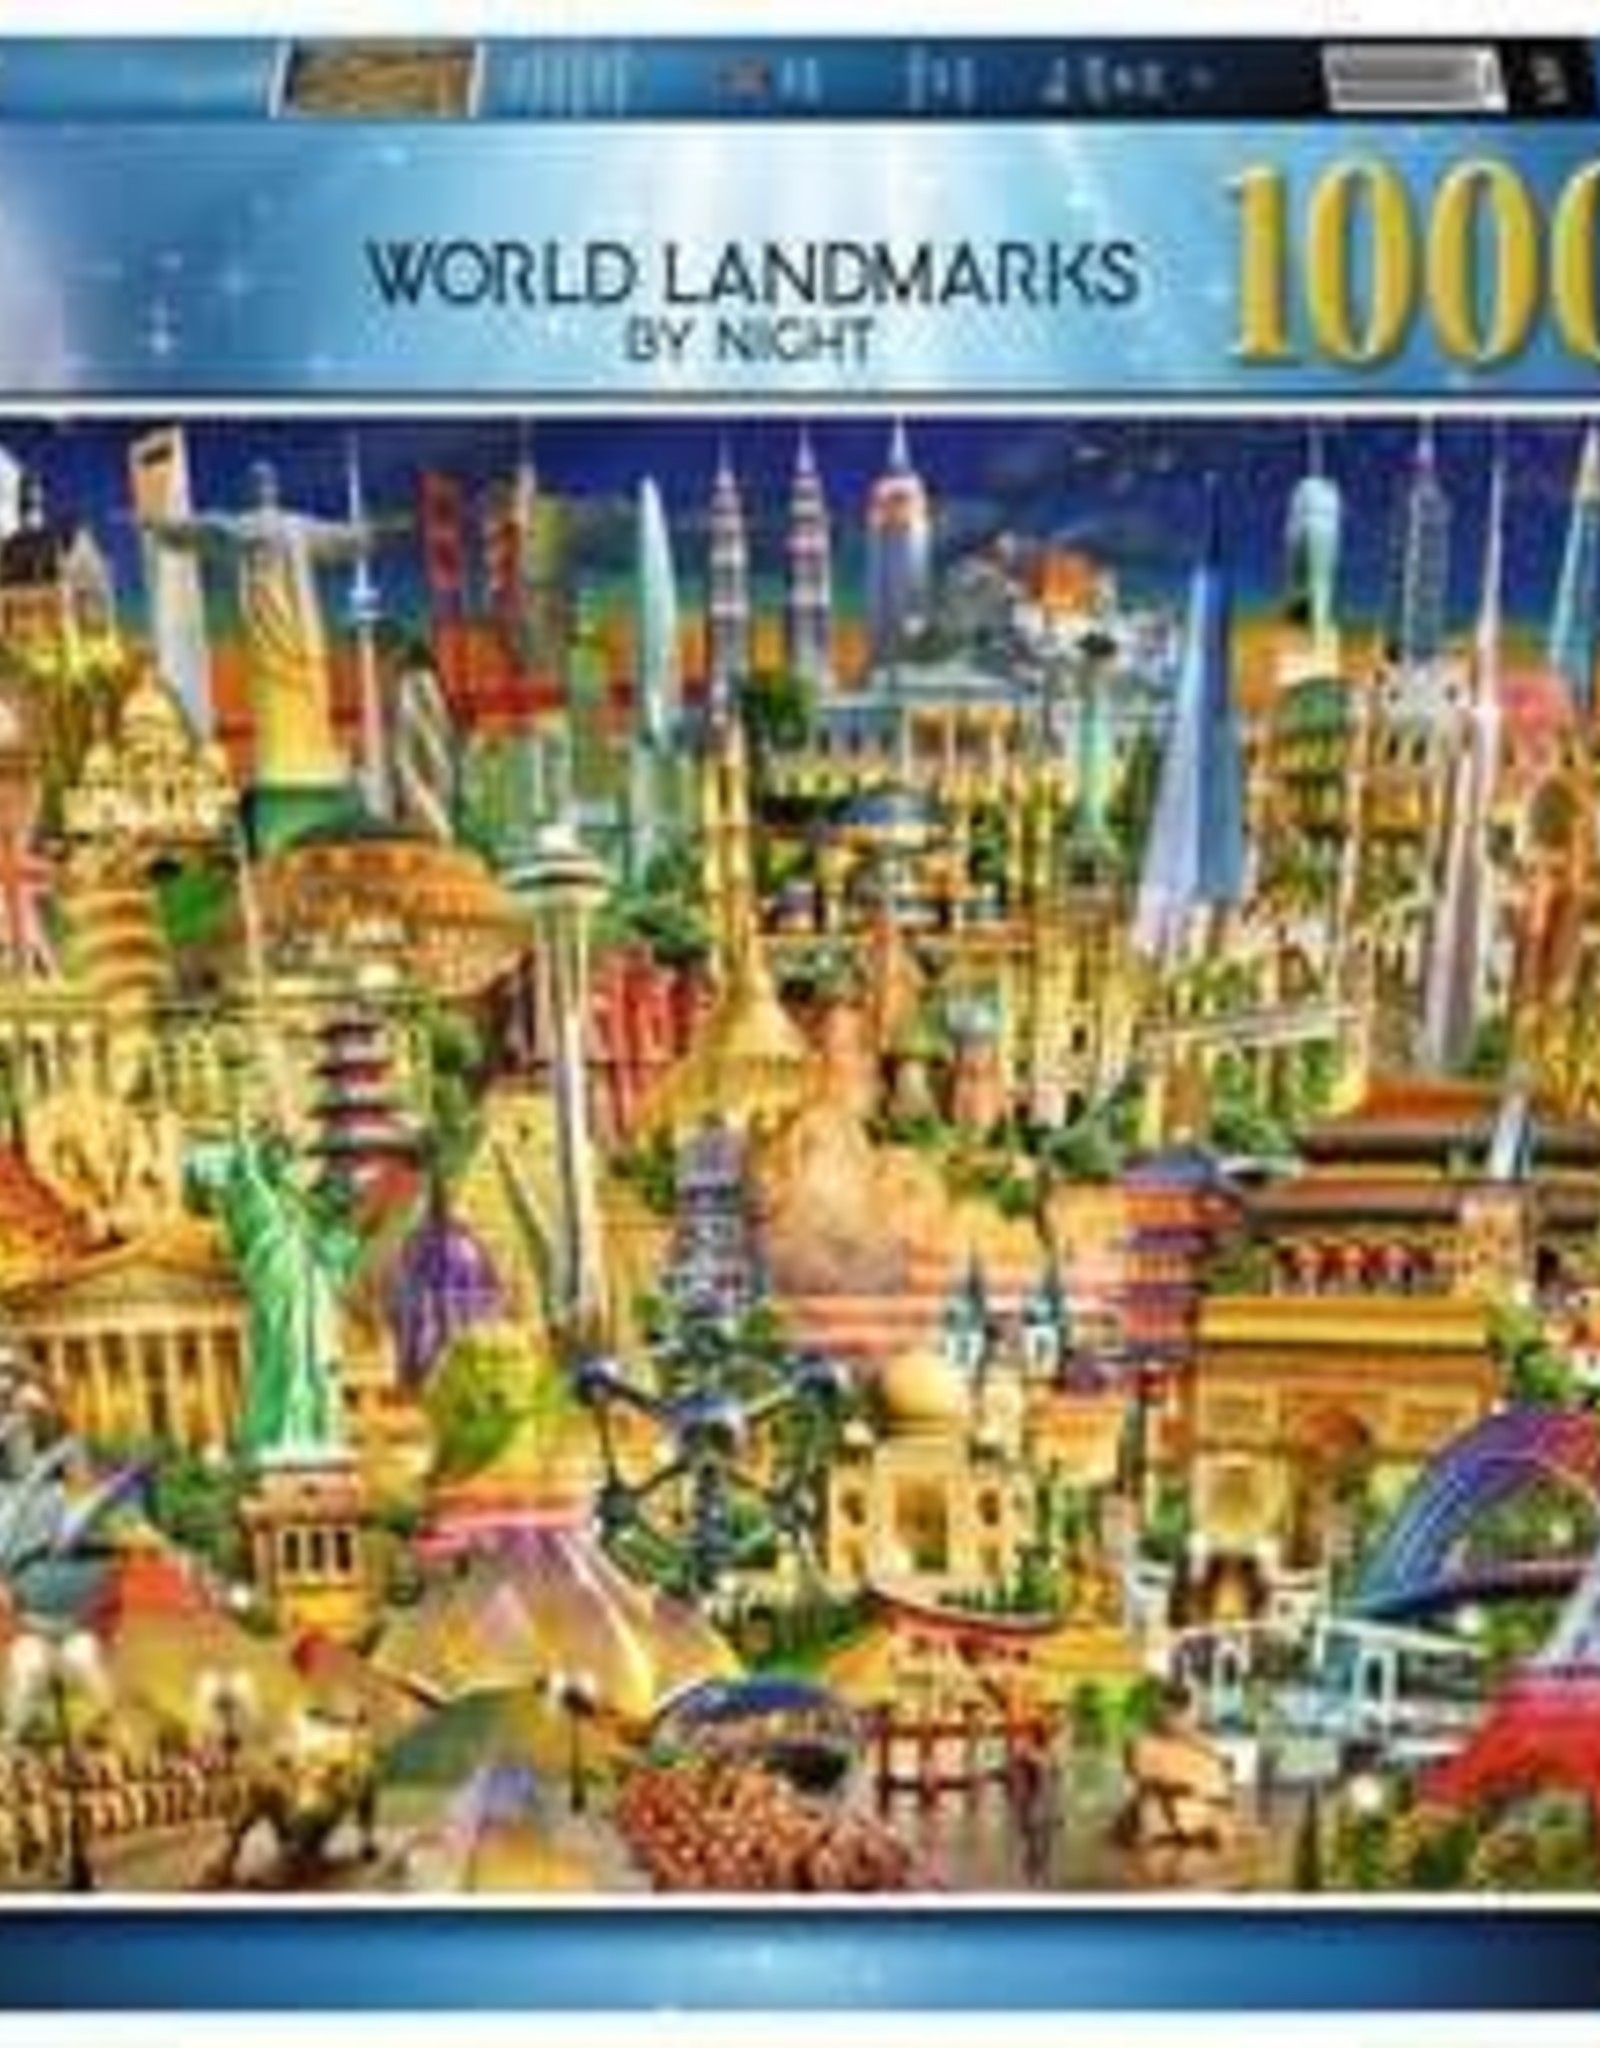 Ravensburger 1000pc World Landmarks at Night